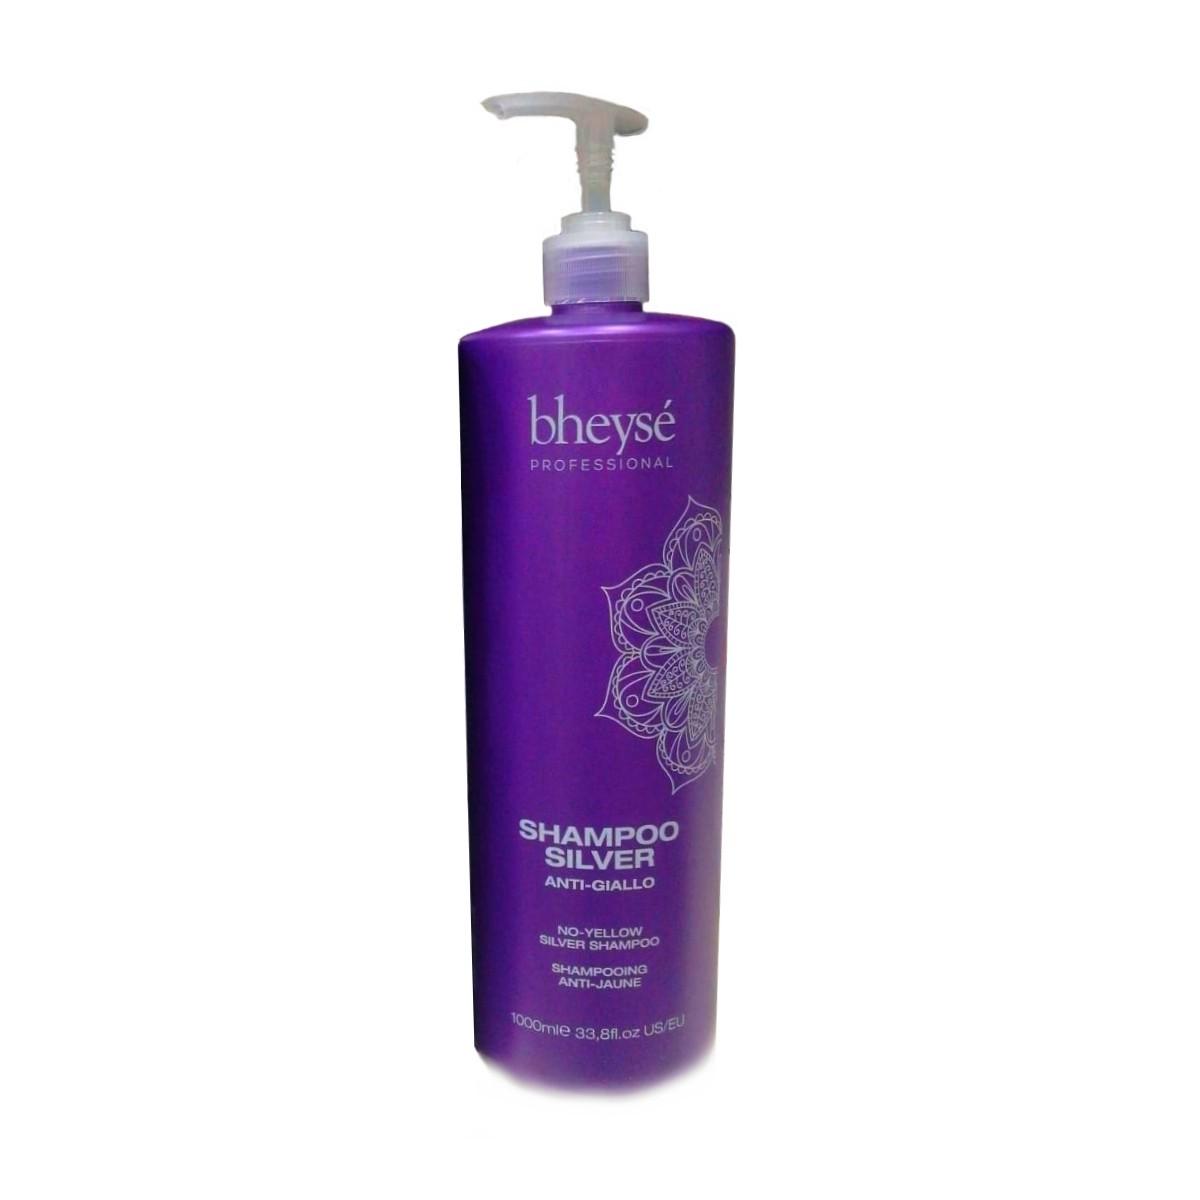 Image of Bheysè Professional Shampoo Anti-Giallo - 1000 ml